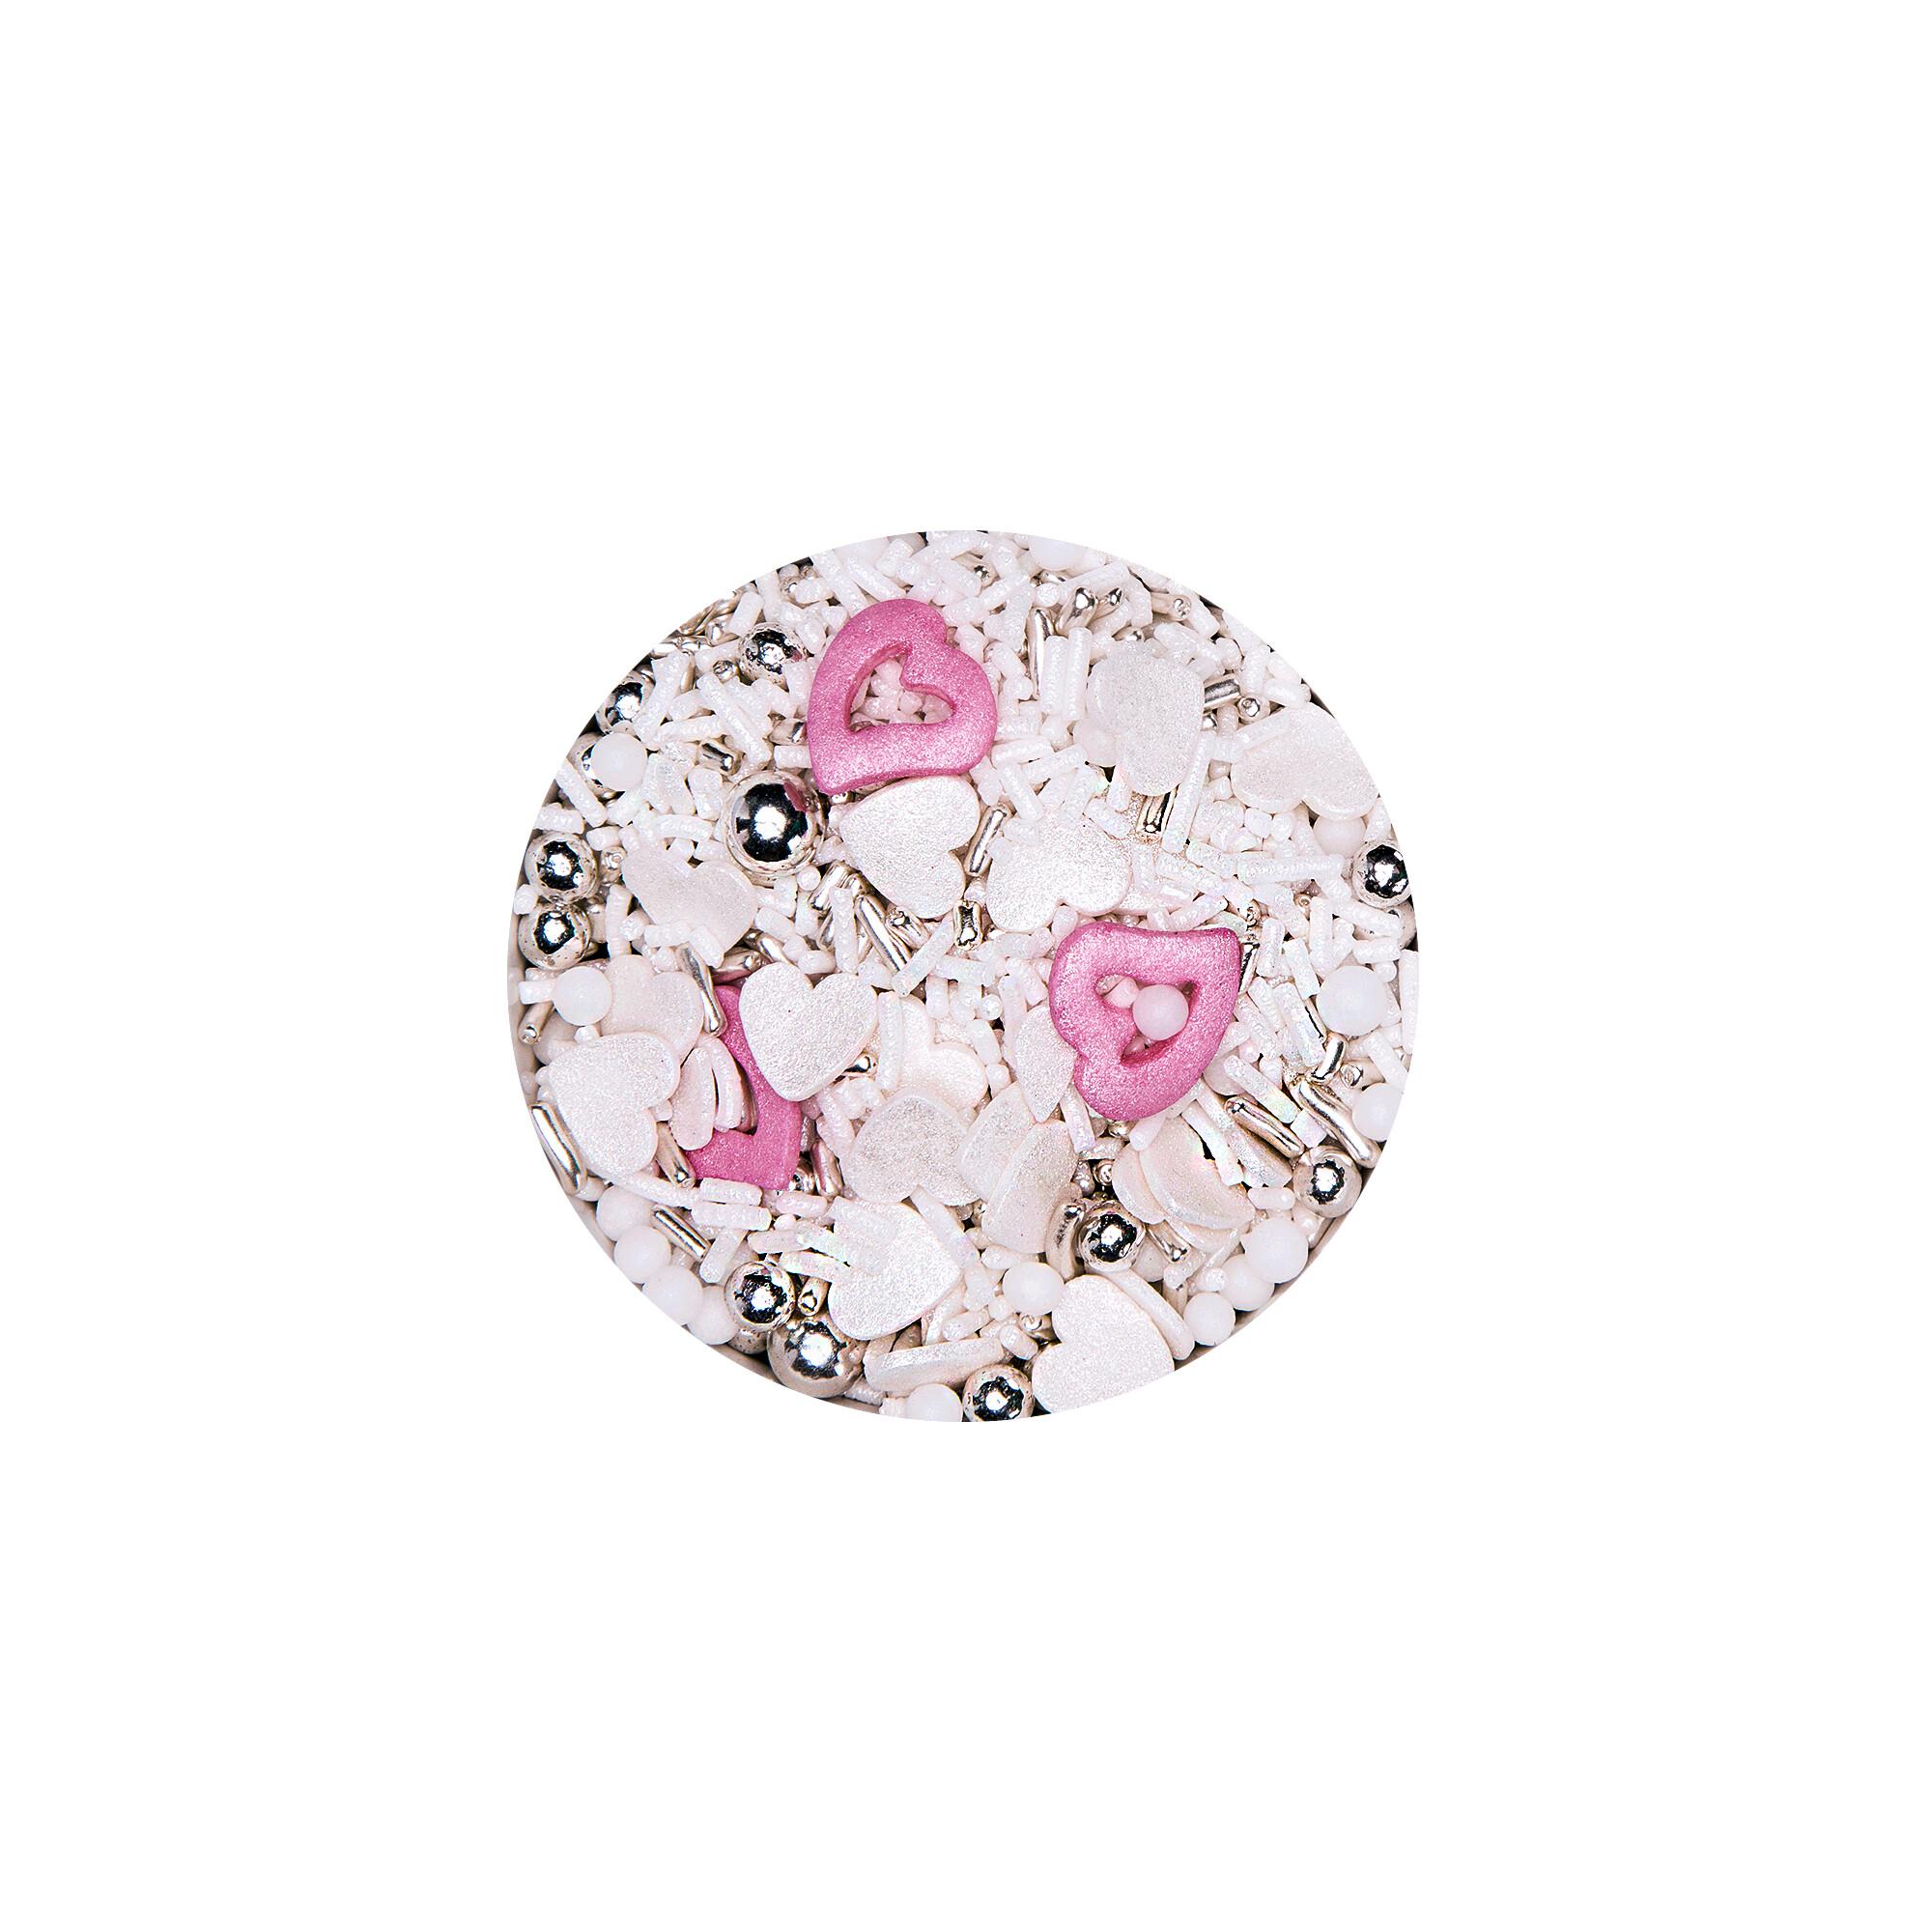 Edible sprinkle decoration - Love - Mix